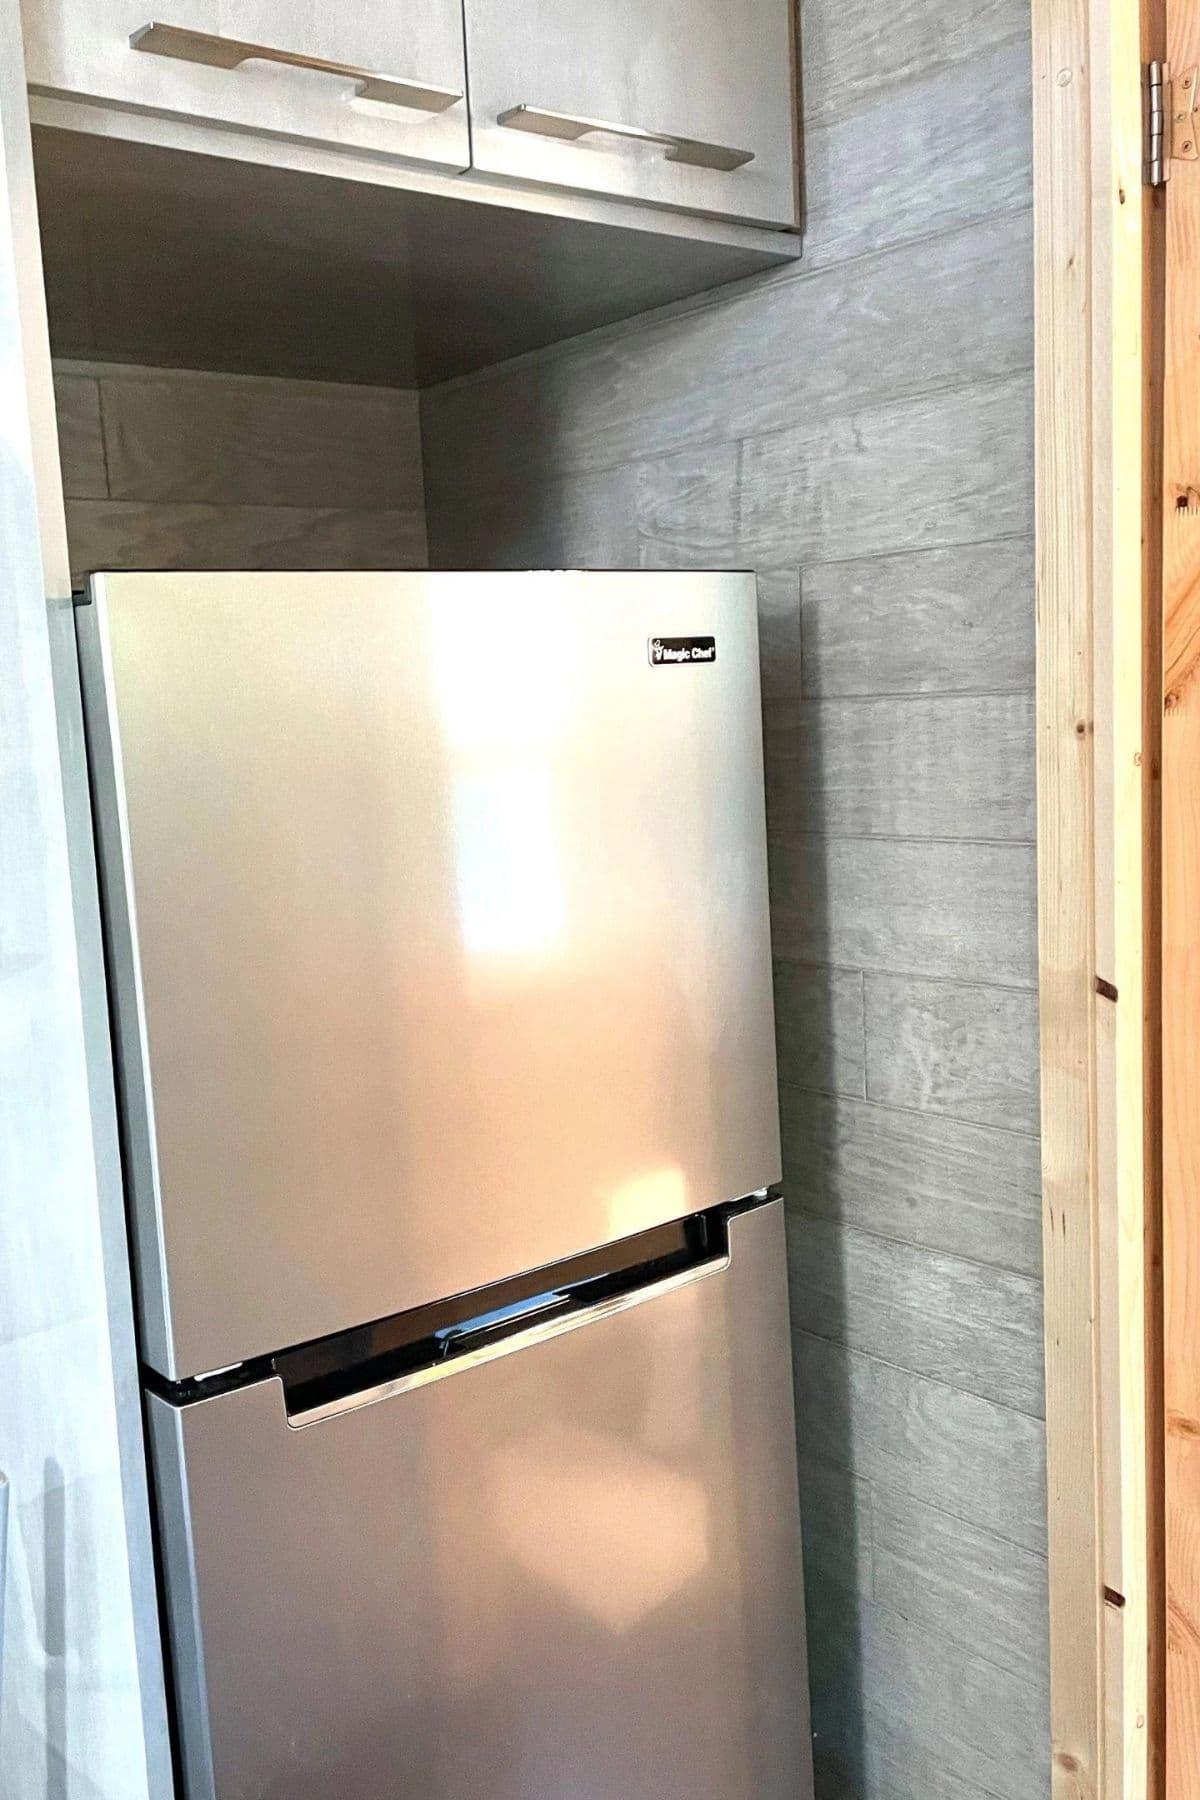 stainless steel refrigerator between walls in kitchen